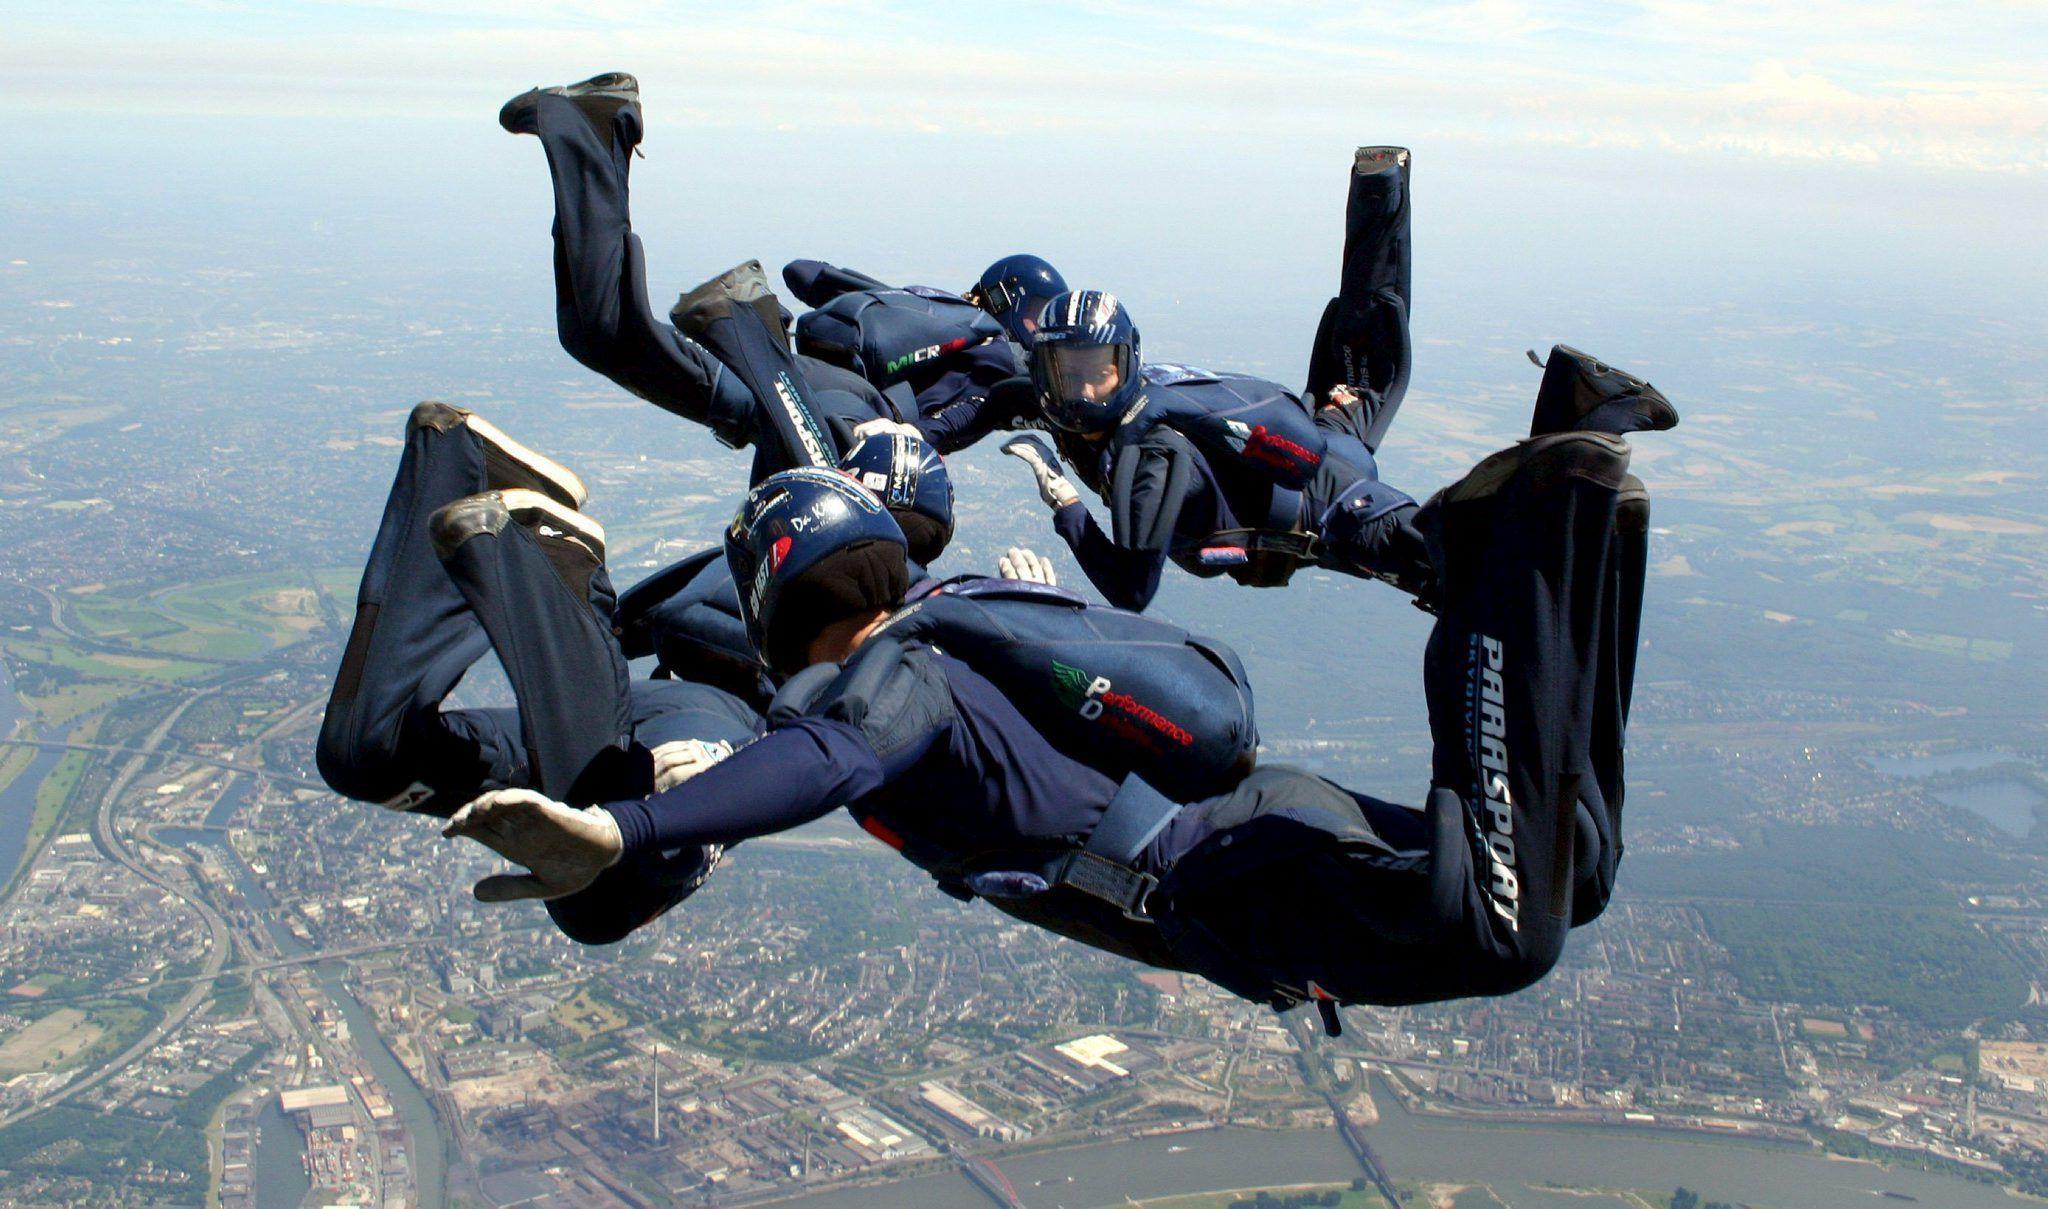 Svetlana Savitskaya estableció récords mundiales de paracaidismo. Crédito: web viajes.efetur.com